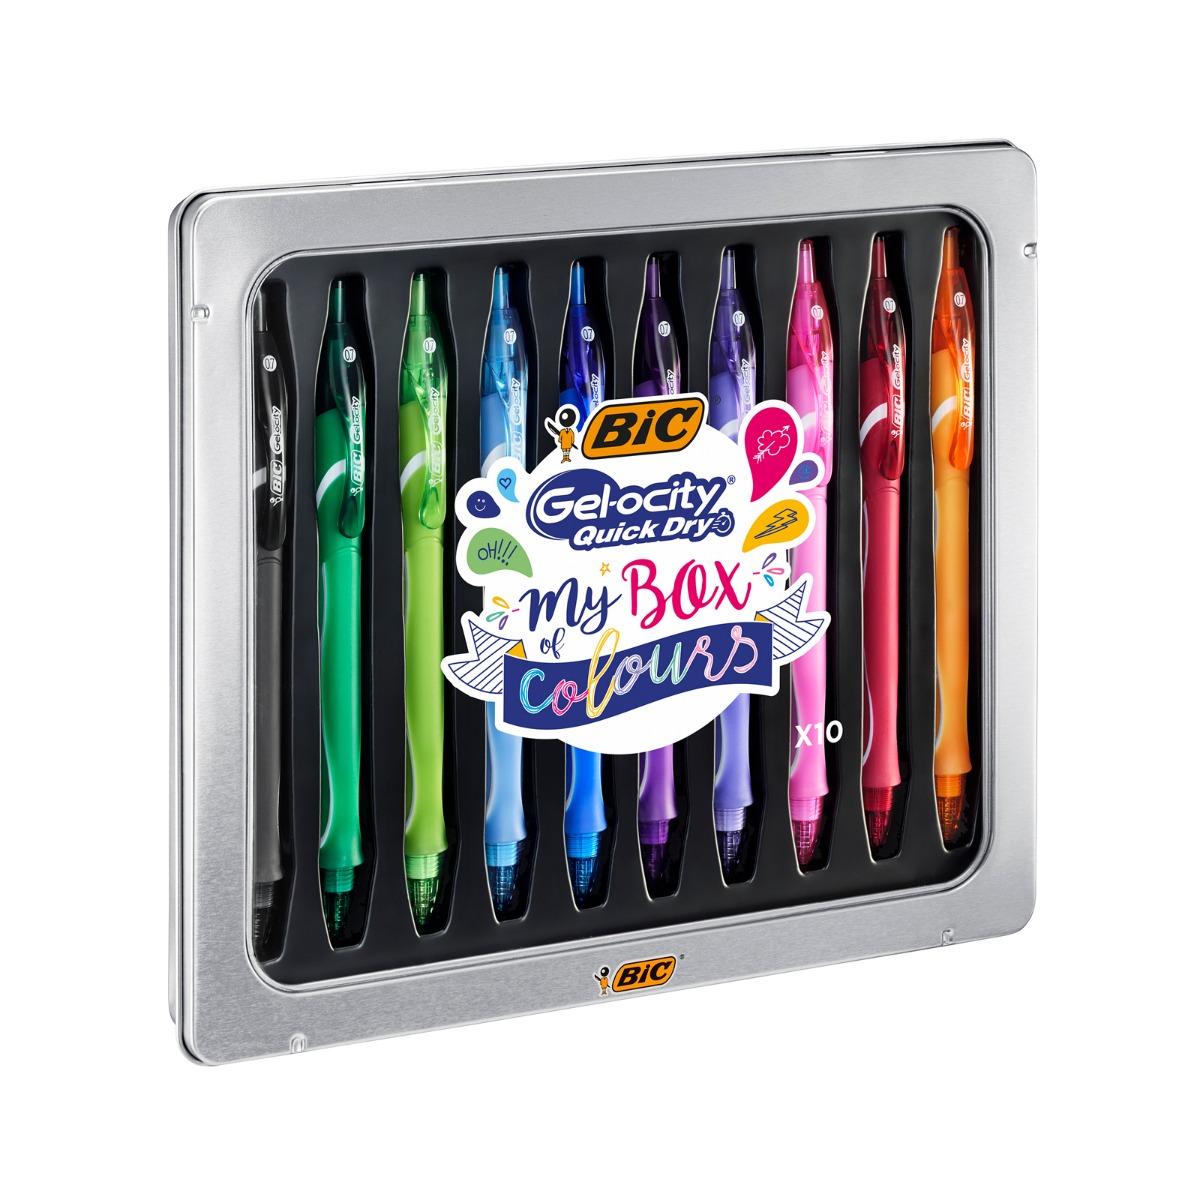 Set Trusa Pixuri Cu Gel Bic - Gel-ocity Quick Dry My Box Of Colours